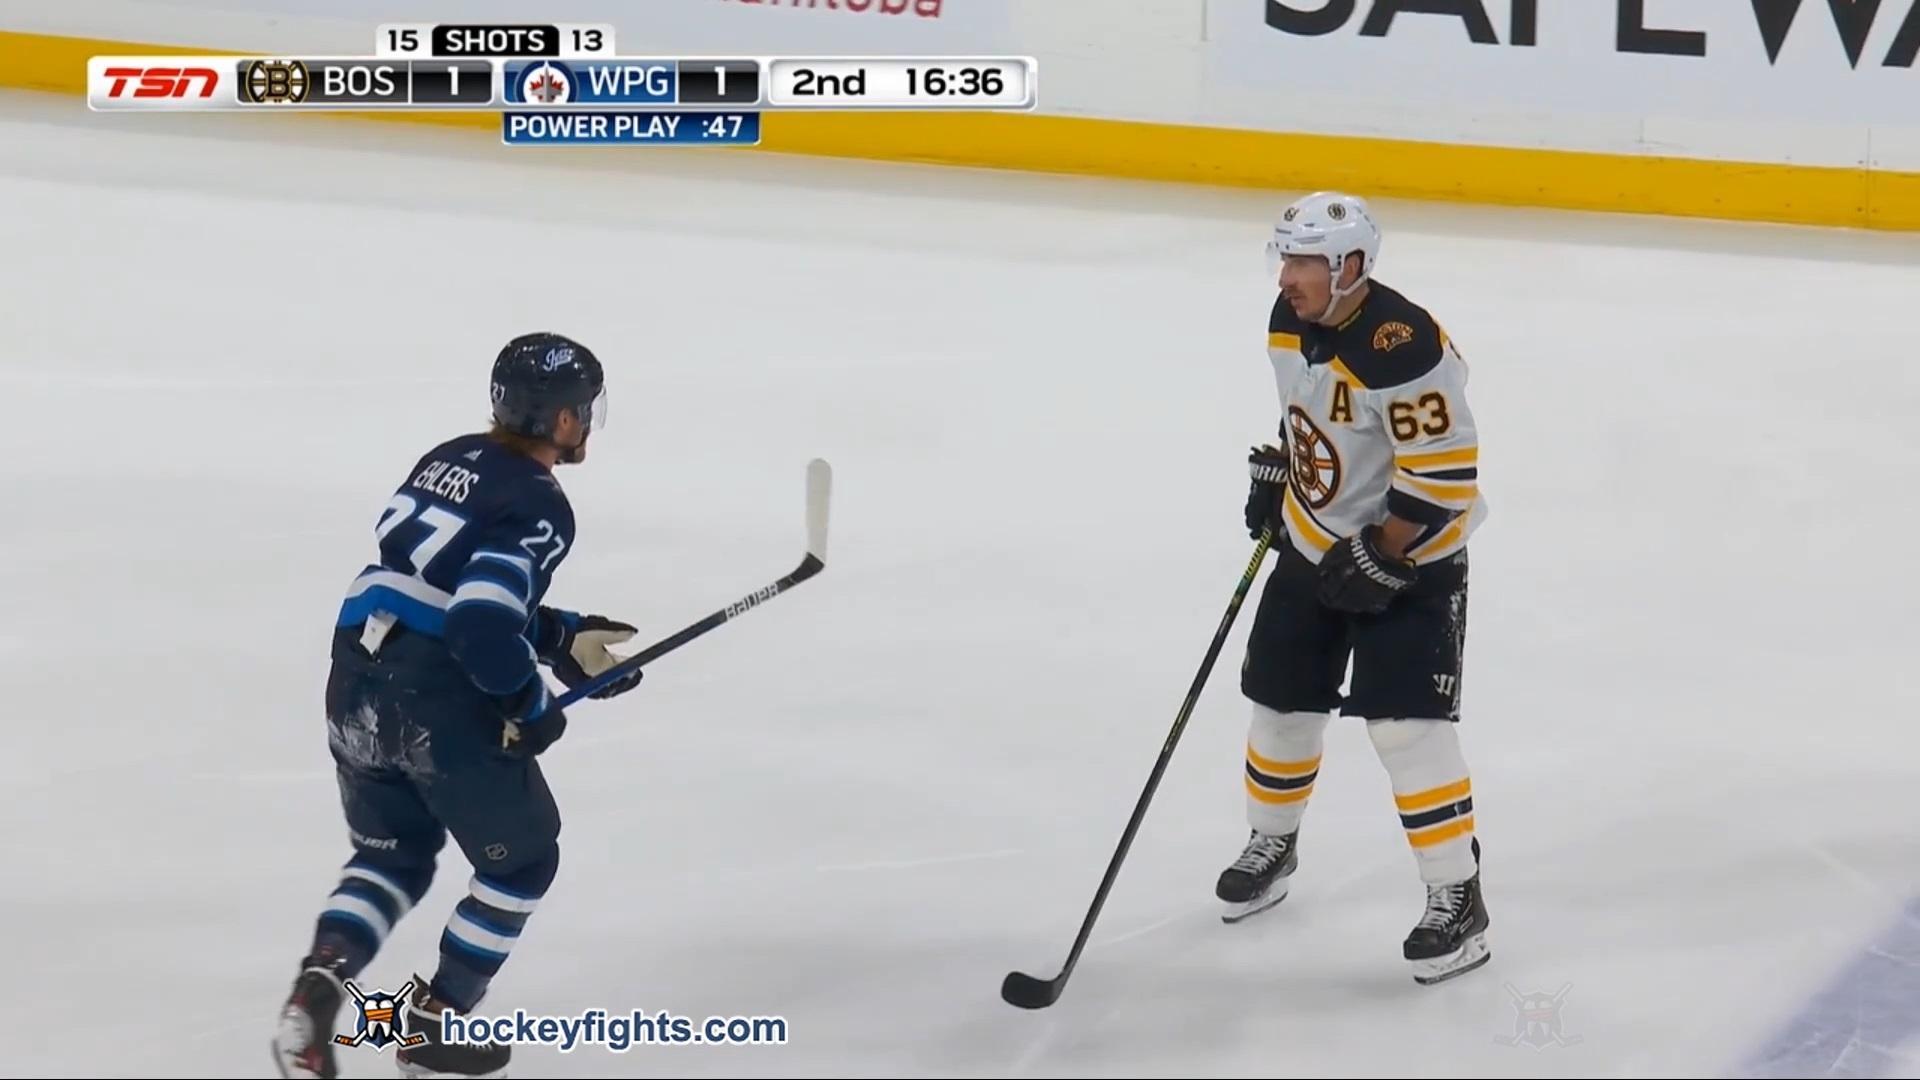 Nikolaj Ehlers vs. Brad Marchand